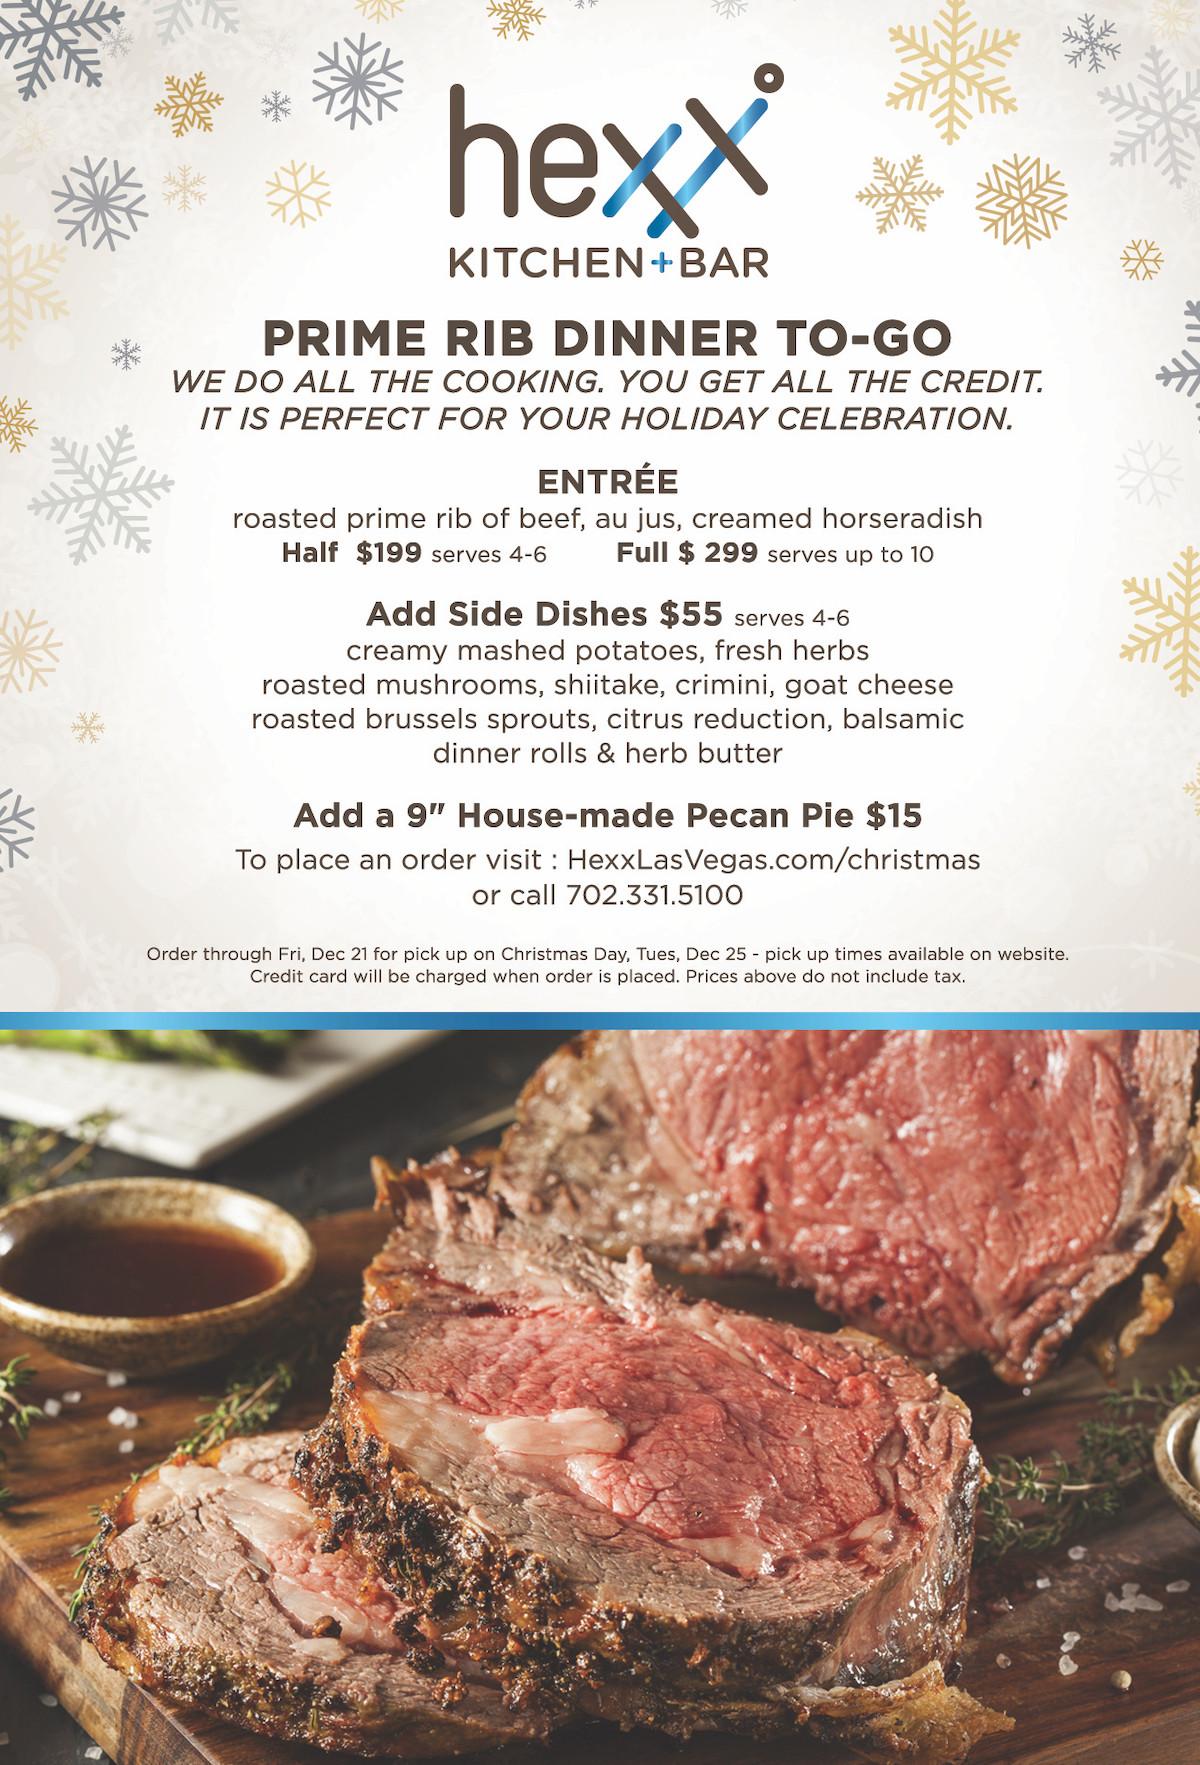 Prime Rib Christmas Dinner Menu  christmas dinner 2018 HEXX kitchen bar Paris Las